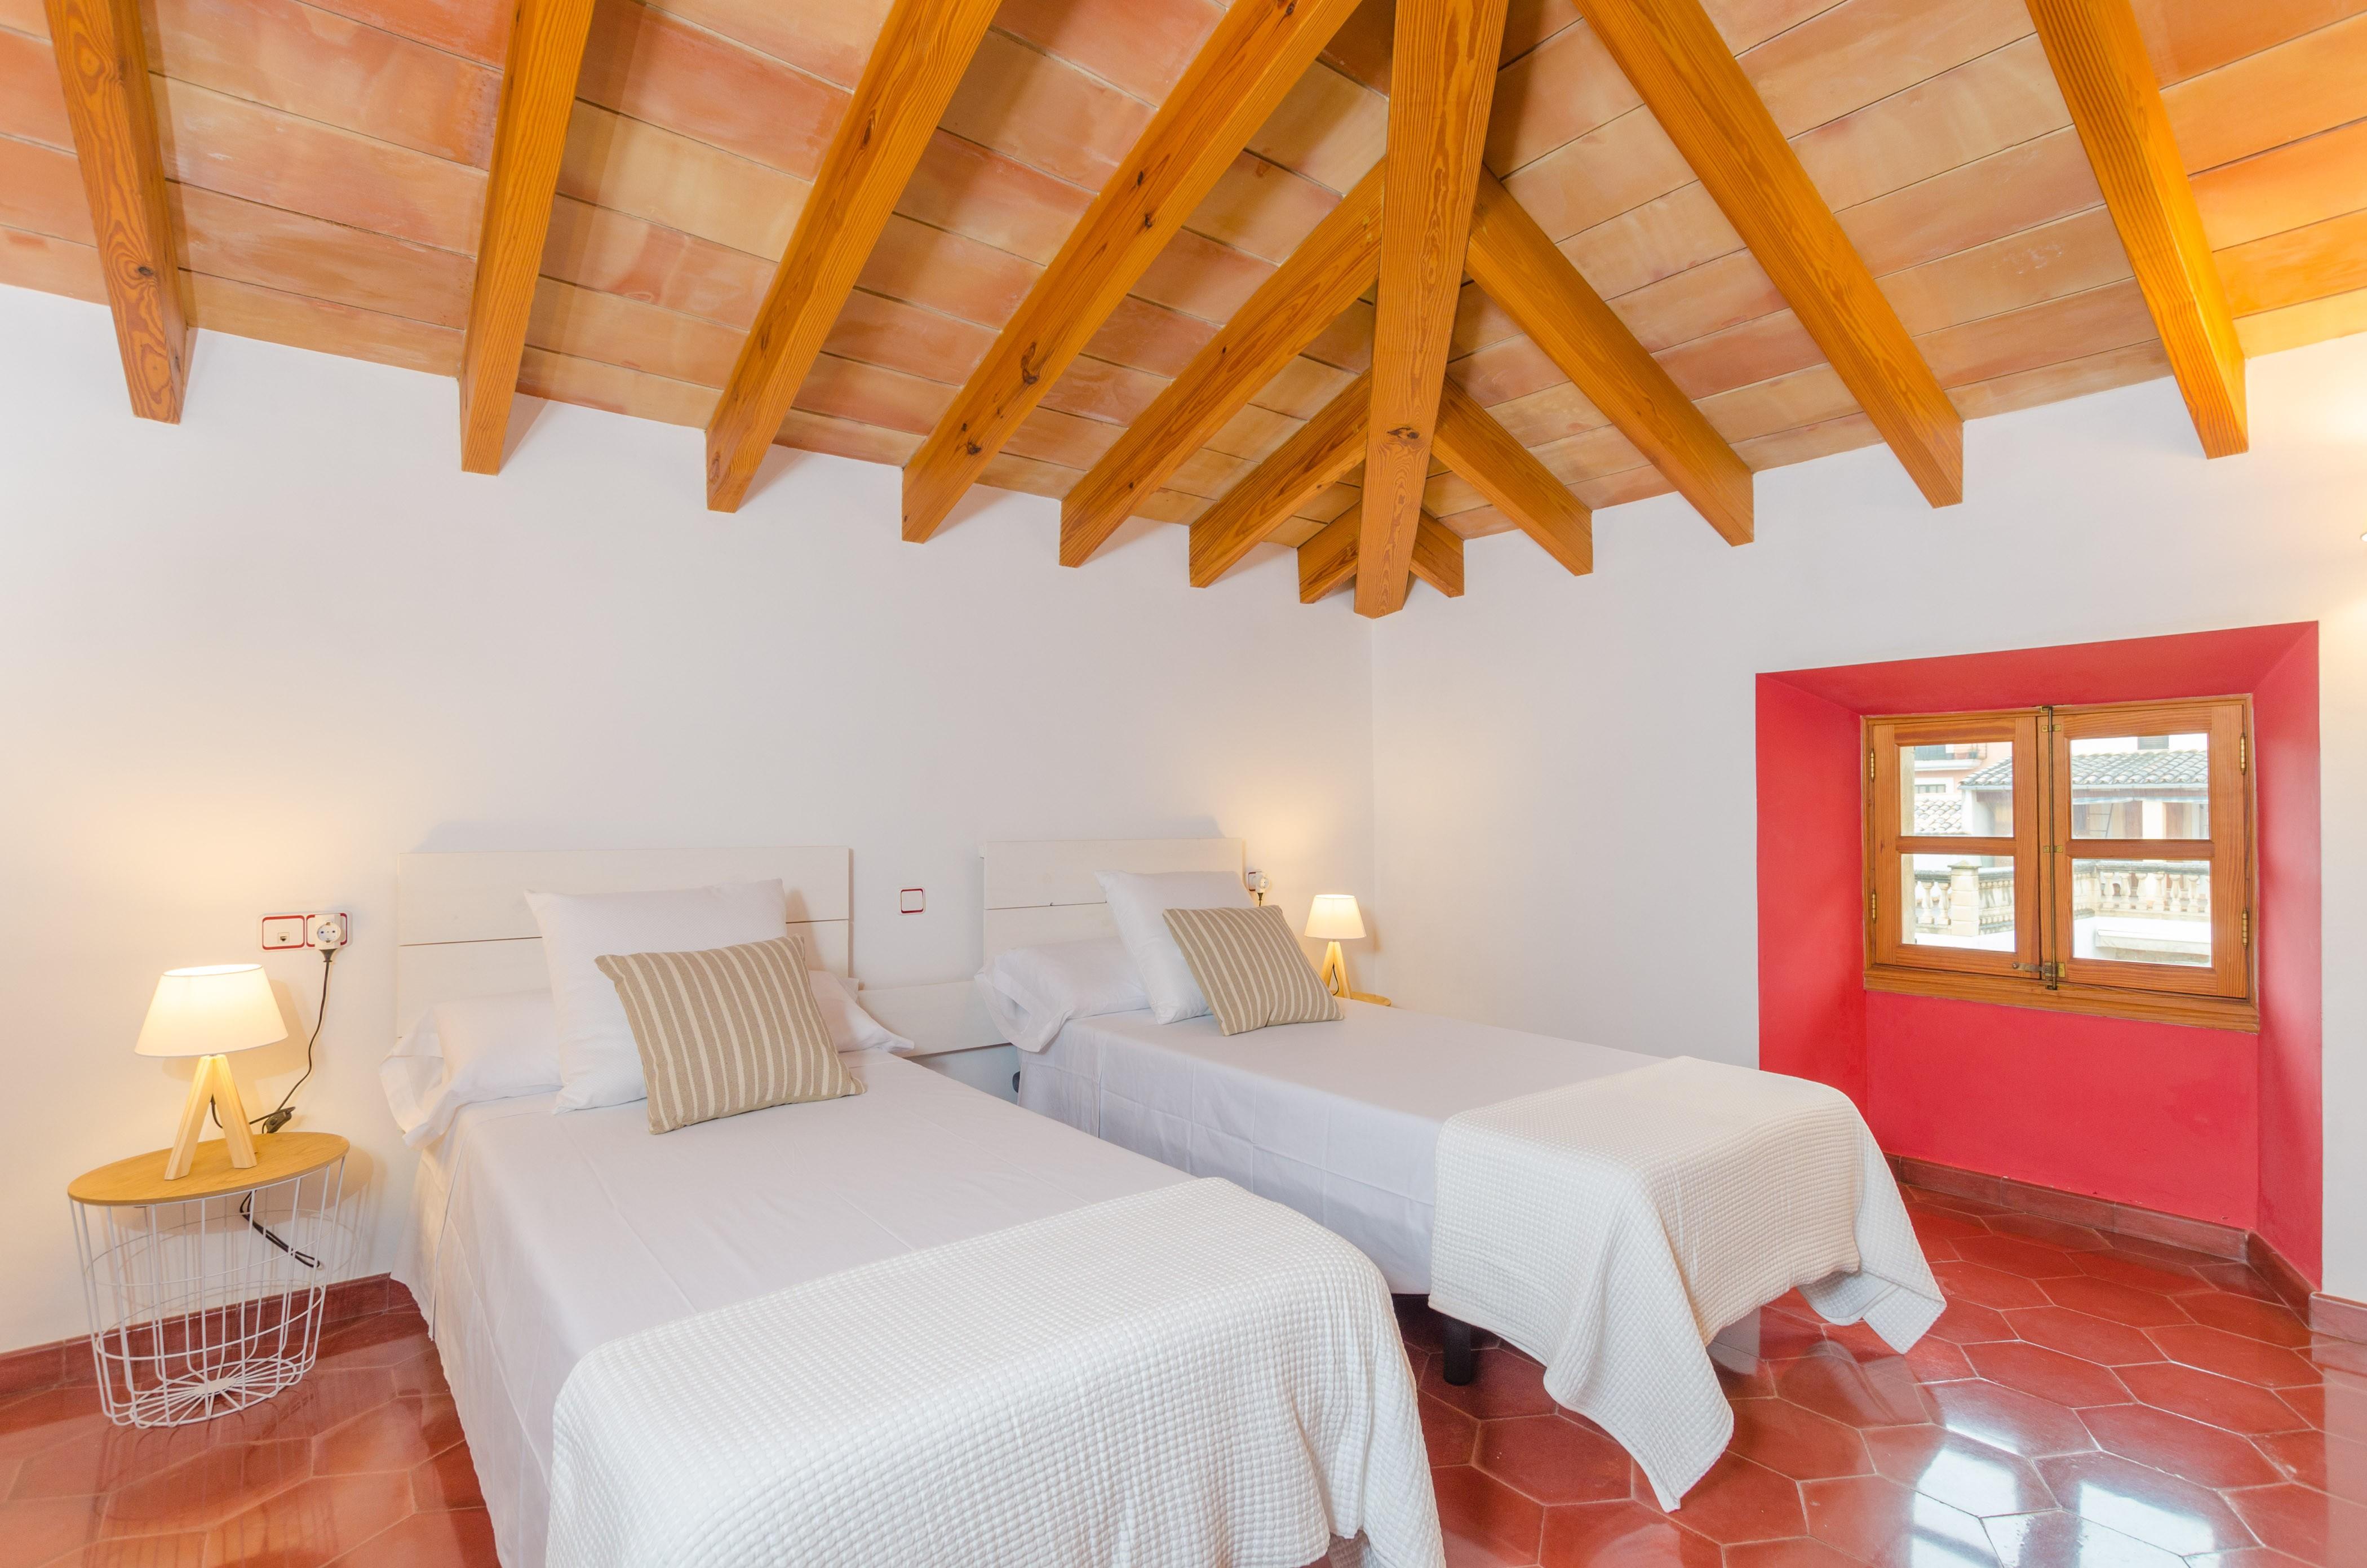 Maison de vacances CAS CONVIDATS (2435013), Alaro, Majorque, Iles Baléares, Espagne, image 51